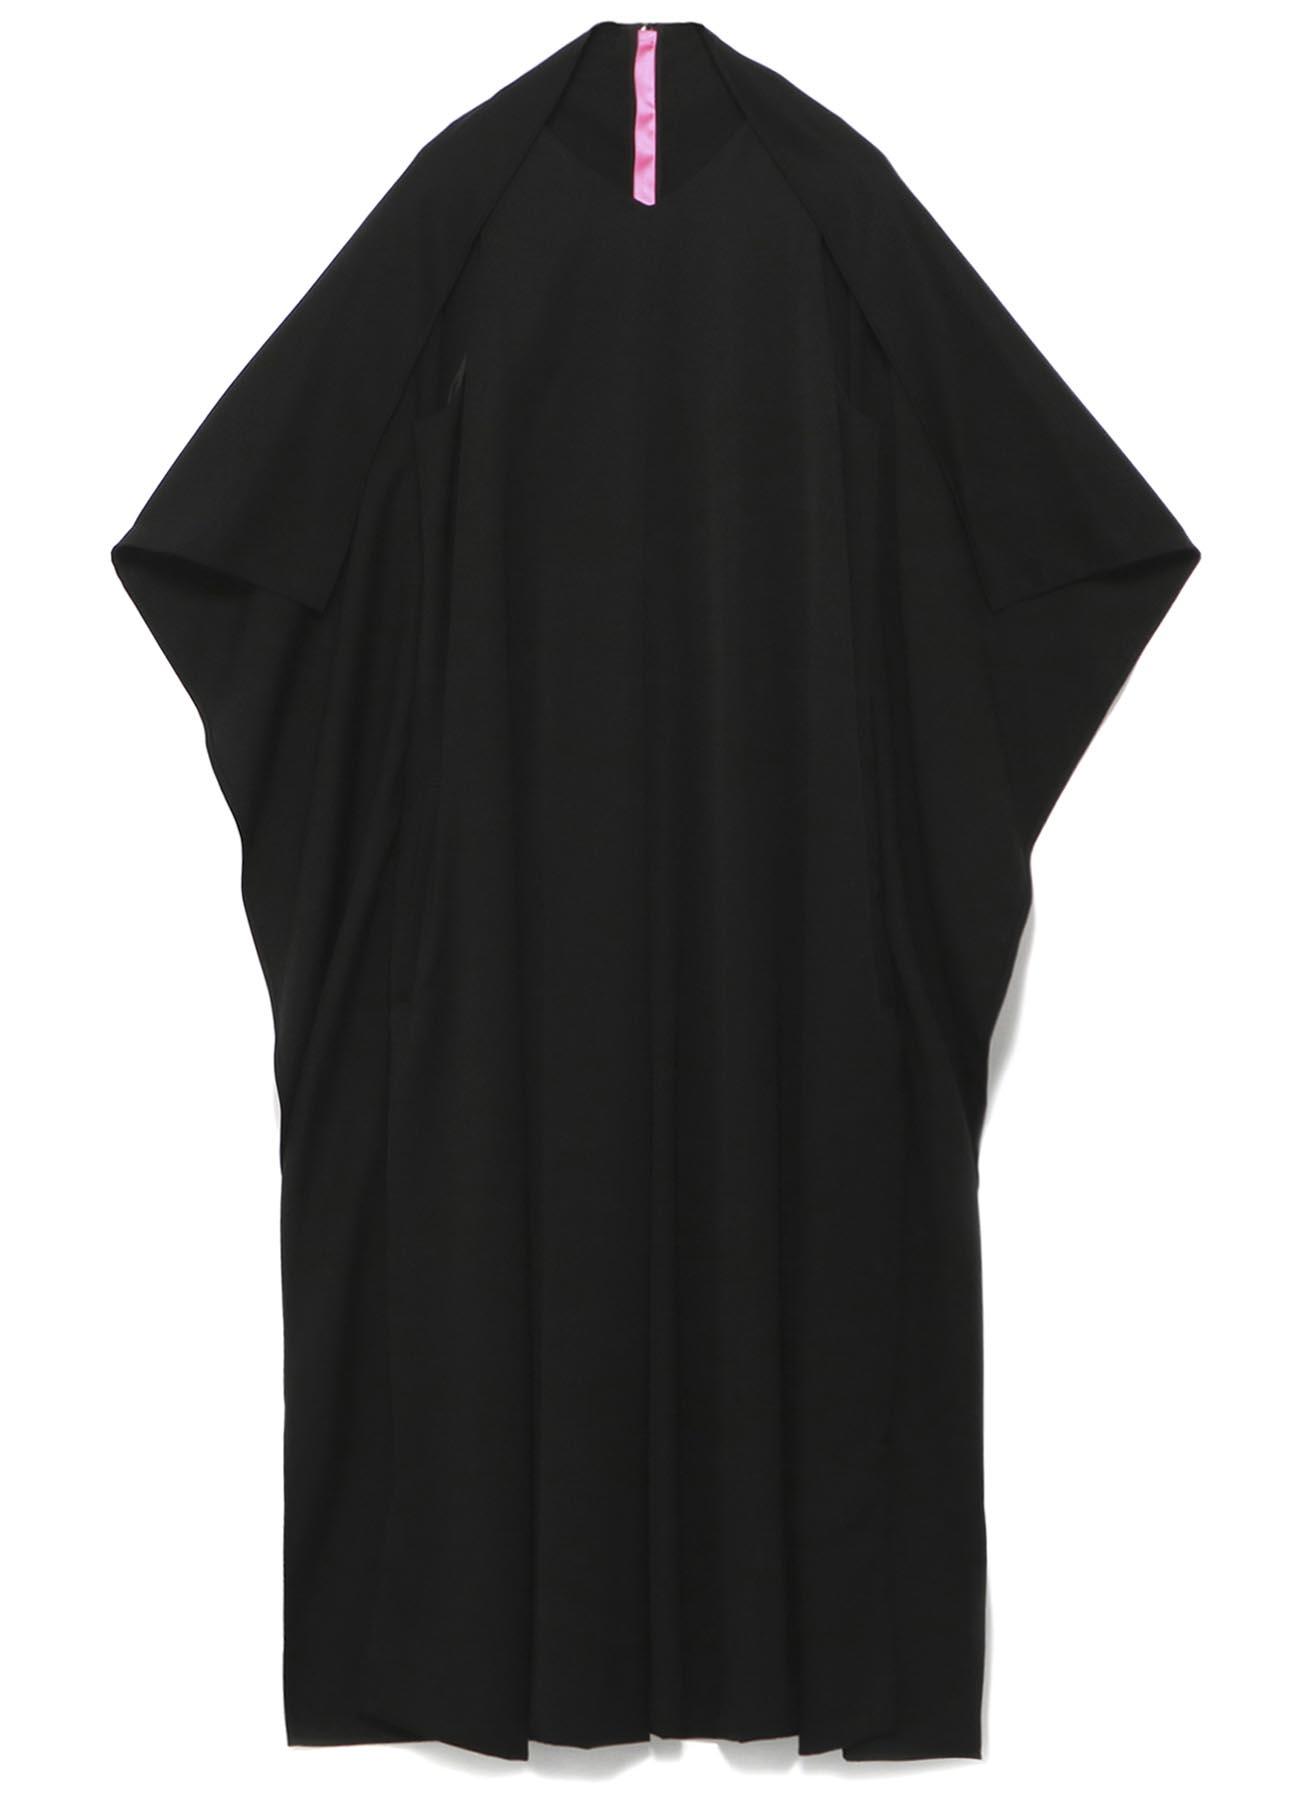 Y'sPINK TUXEDO CLOTH BINDING DRESS